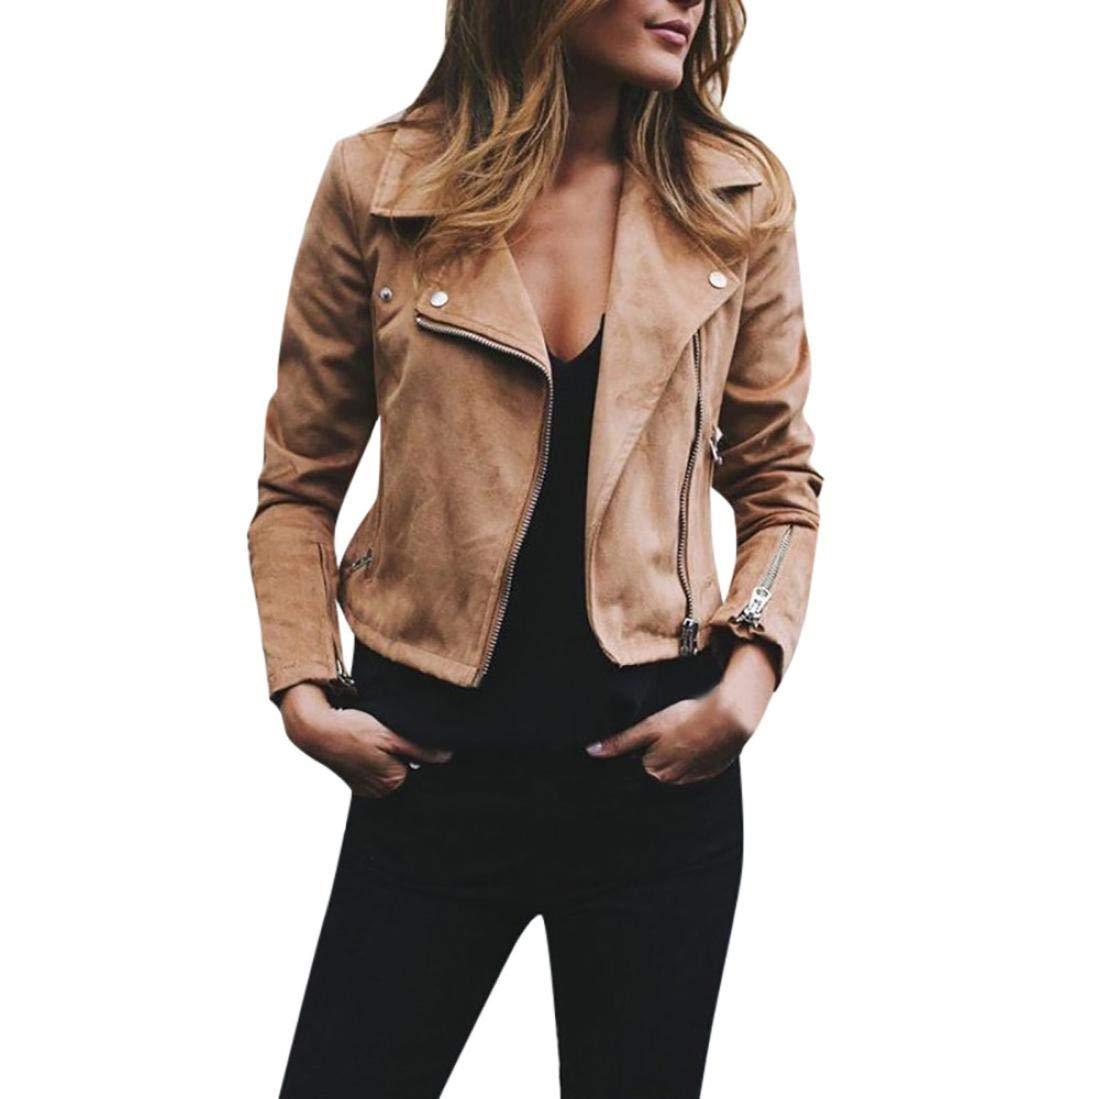 Sikye Women Short Coat Ladies Retro Rivet Zip Bomber Coat Outwear Autumn Street Style